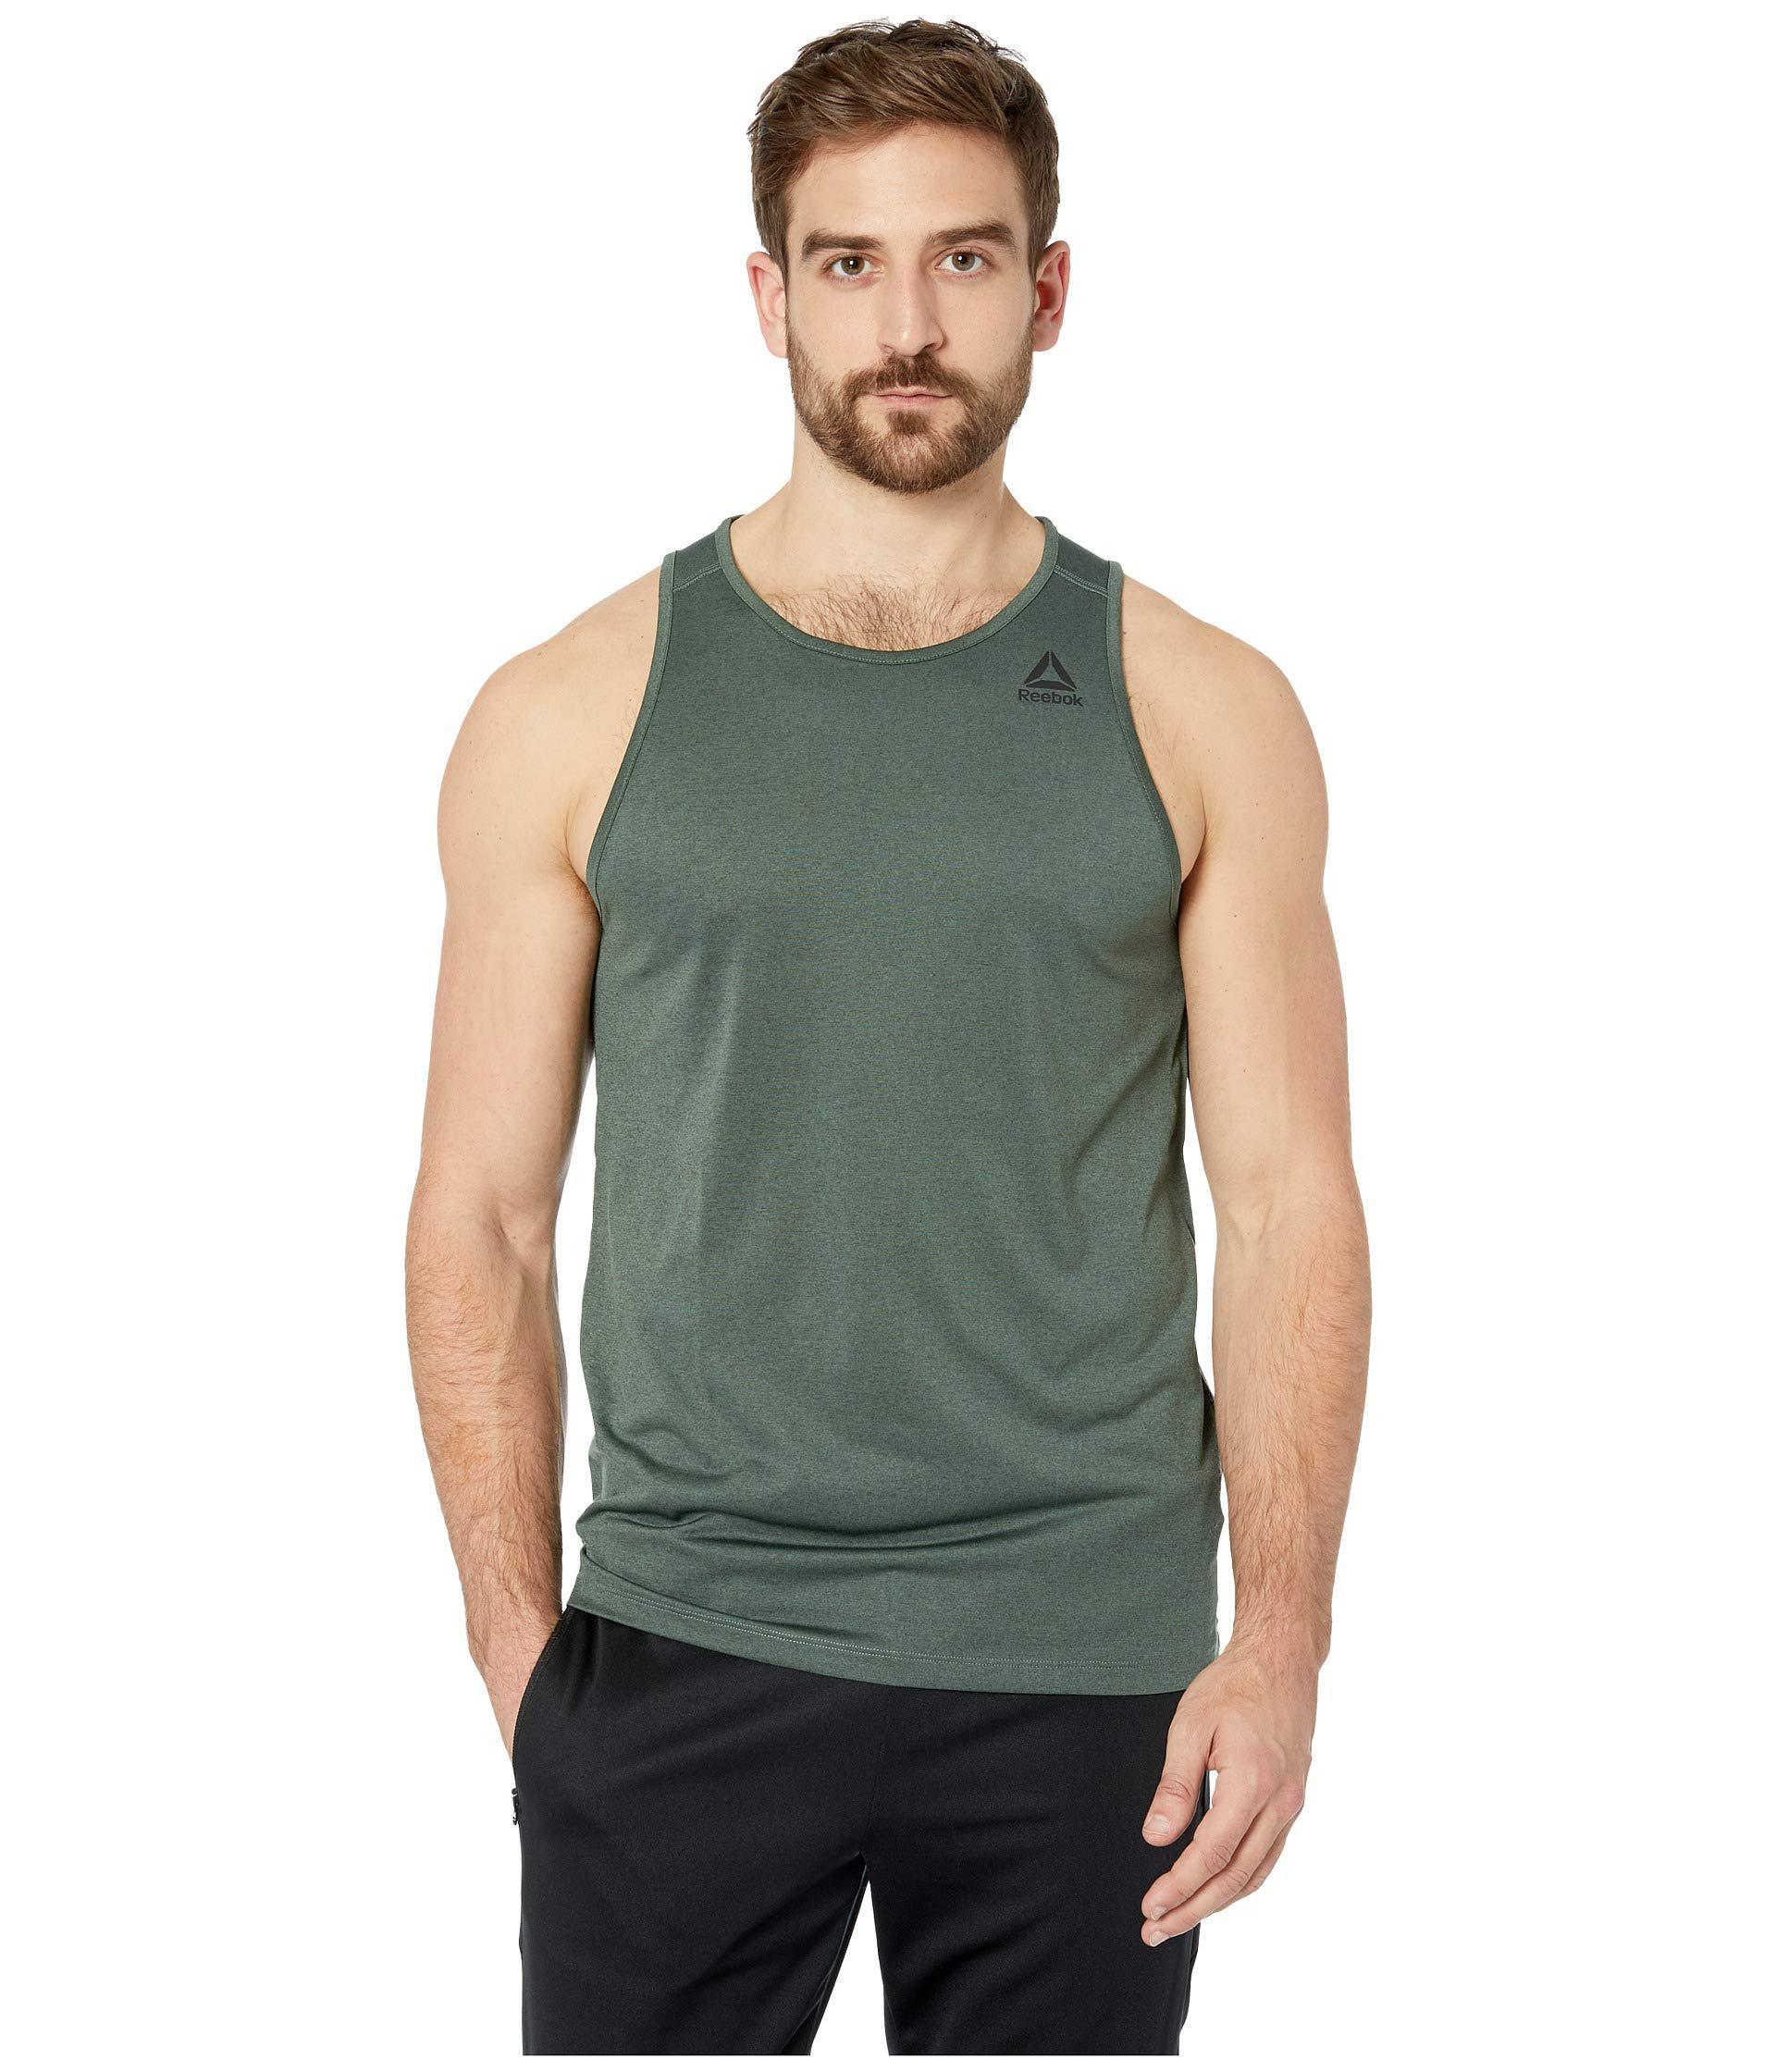 fe36bda087a6d8 Reebok - Green Melange Sleeveless Tee for Men - Lyst. View fullscreen